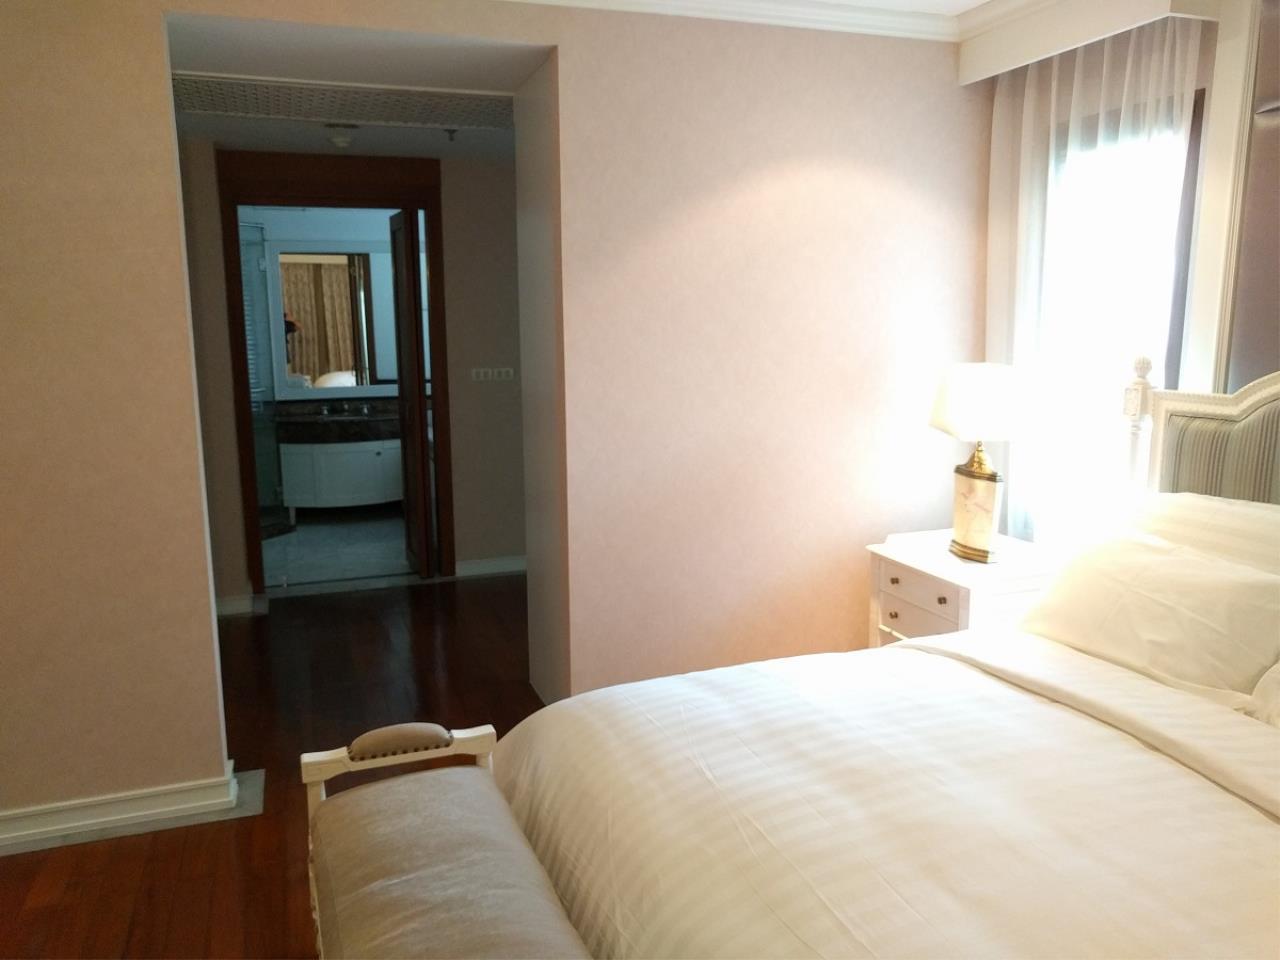 RE/MAX CondoDee Agency's Thai Elegance Luxury Condominium - Entire Building for Sale 10